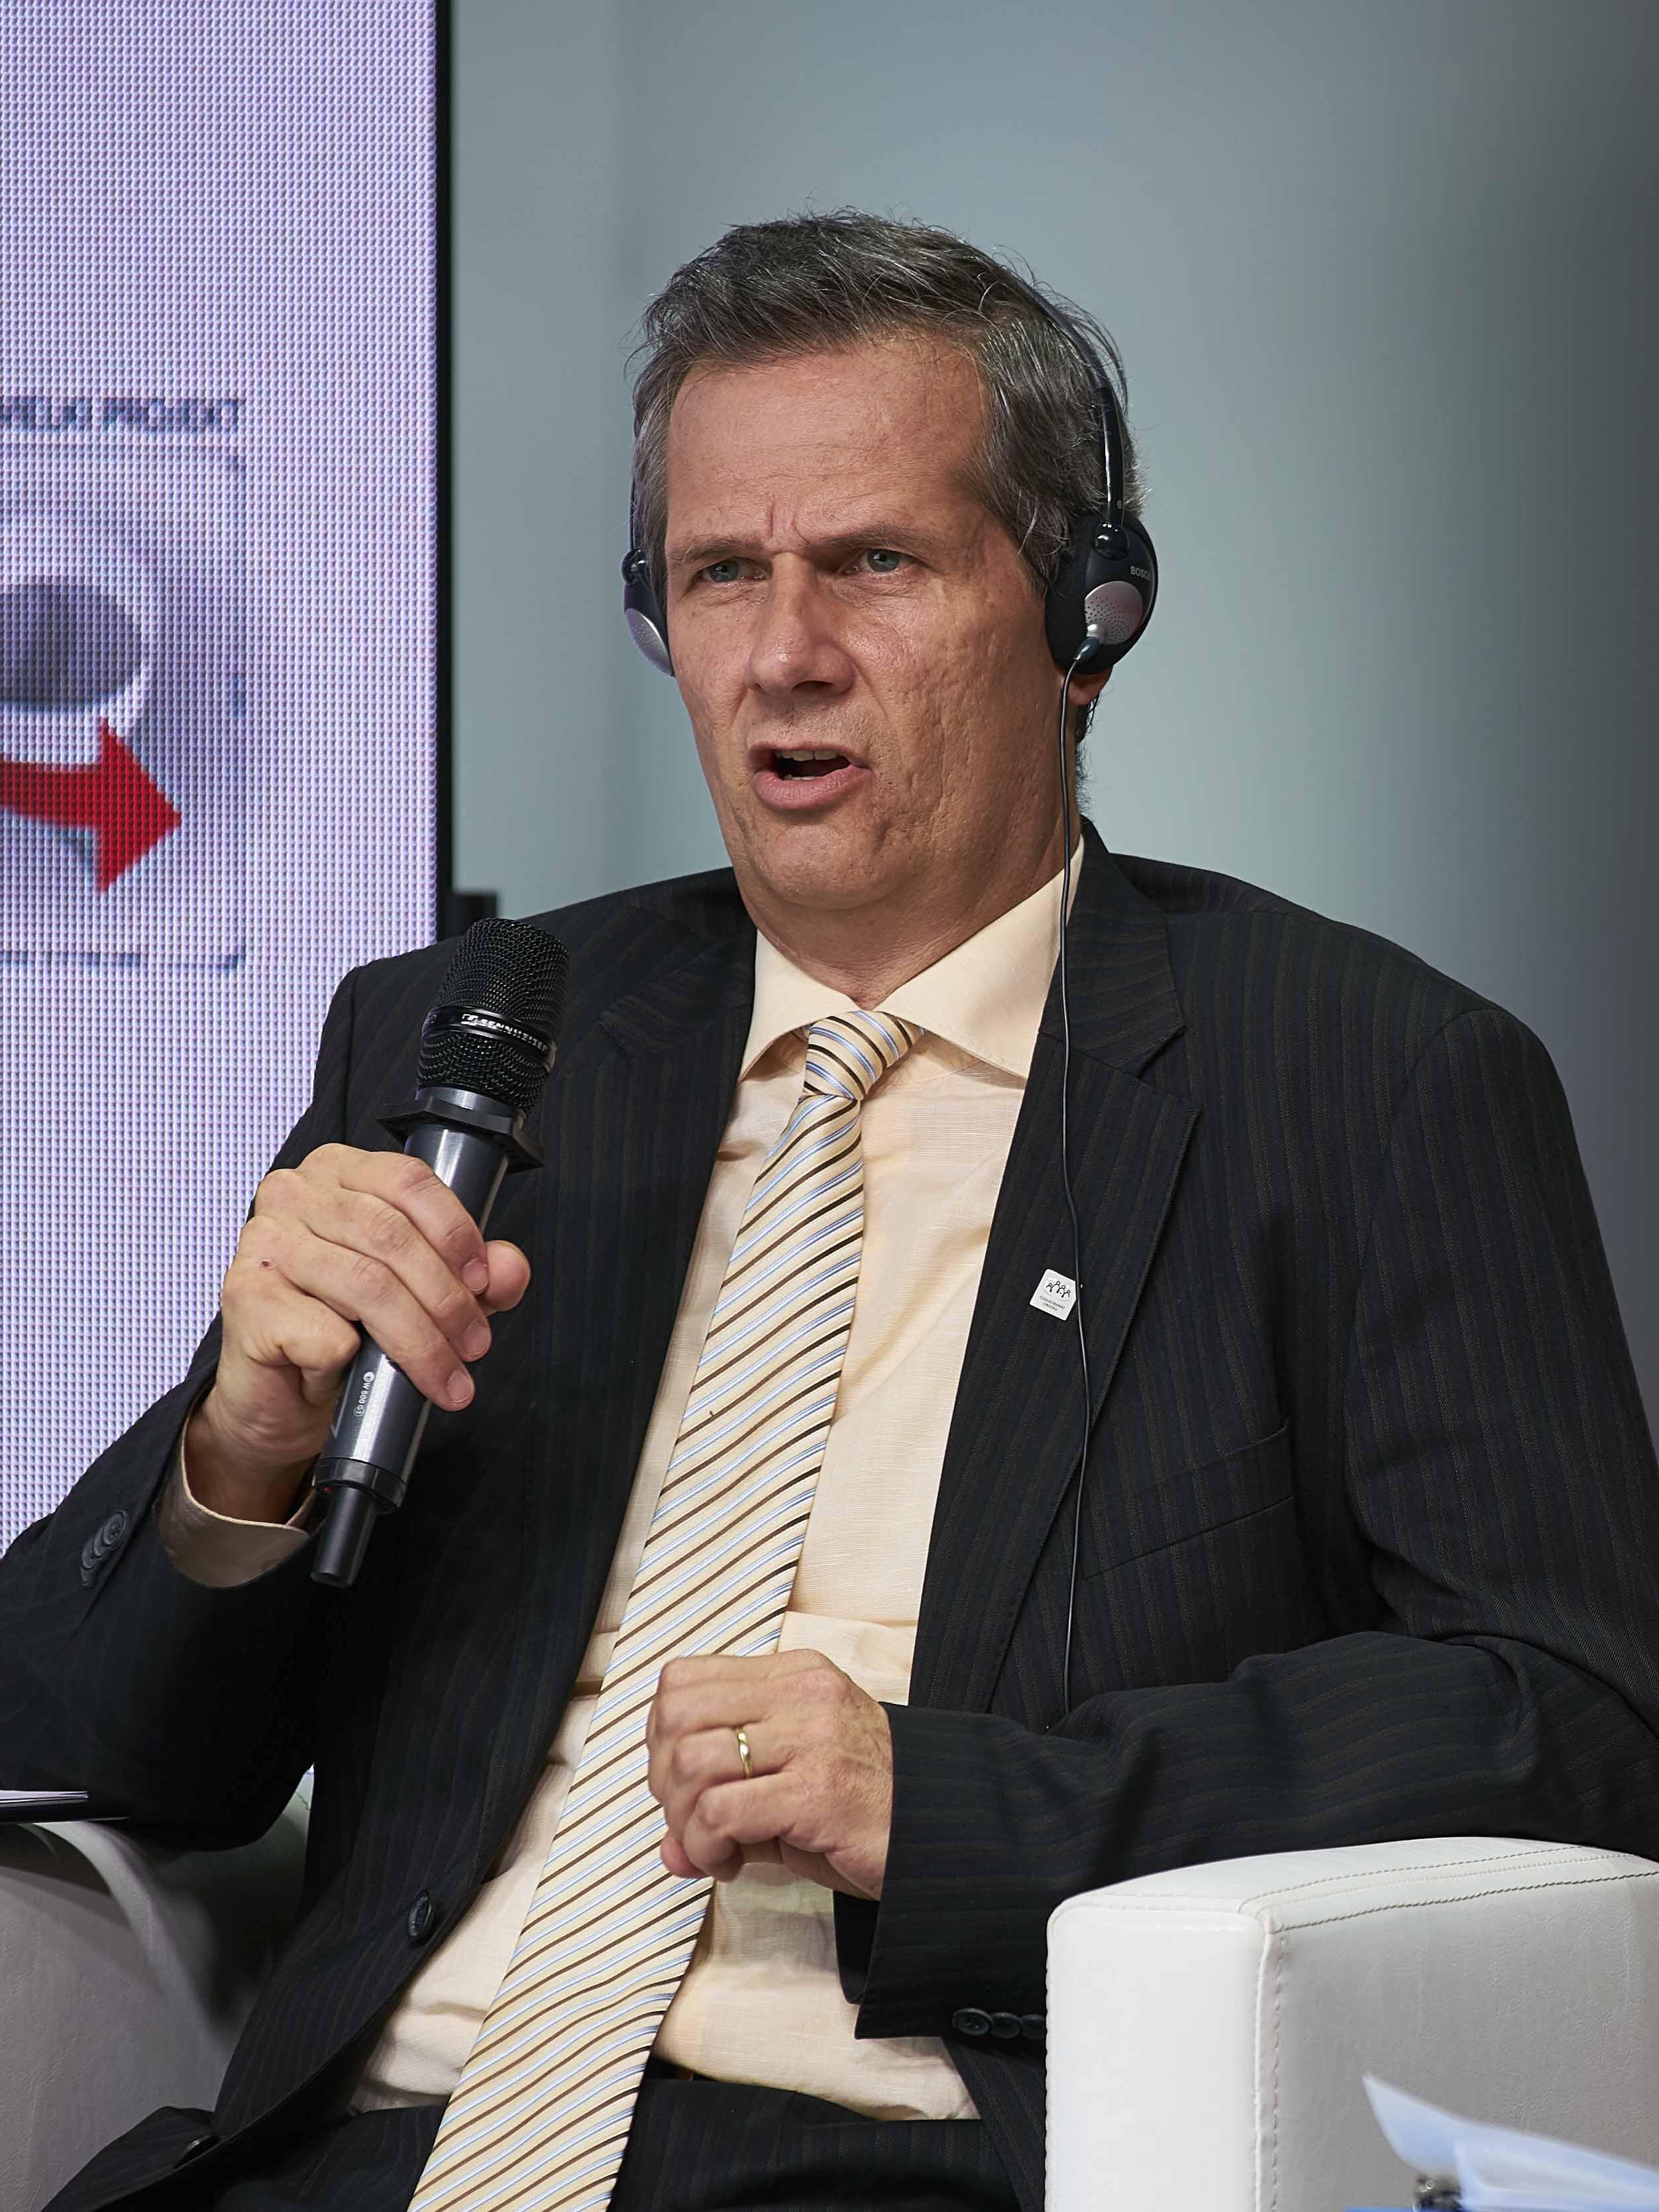 Attila Beneda, podsekretarz stanu ds. rodziny i demografii